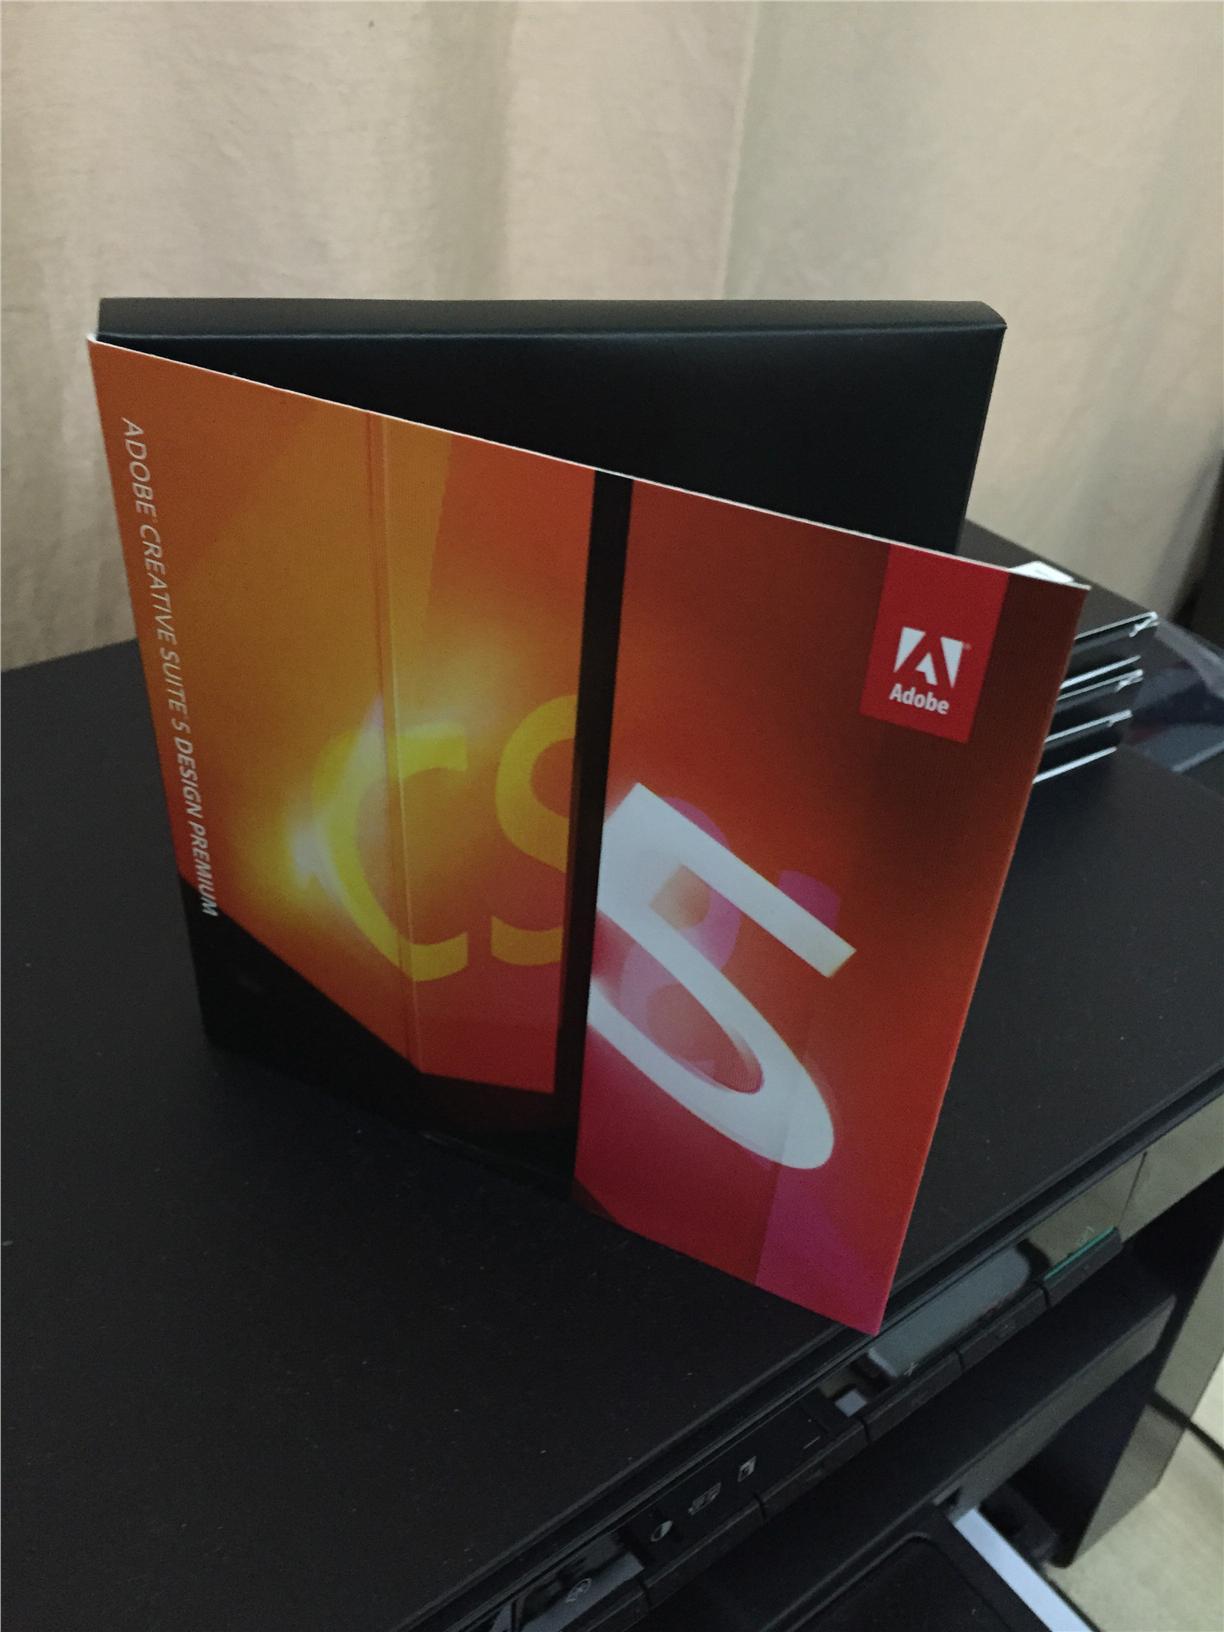 Buy Cheap Adobe CS5 Design Premium